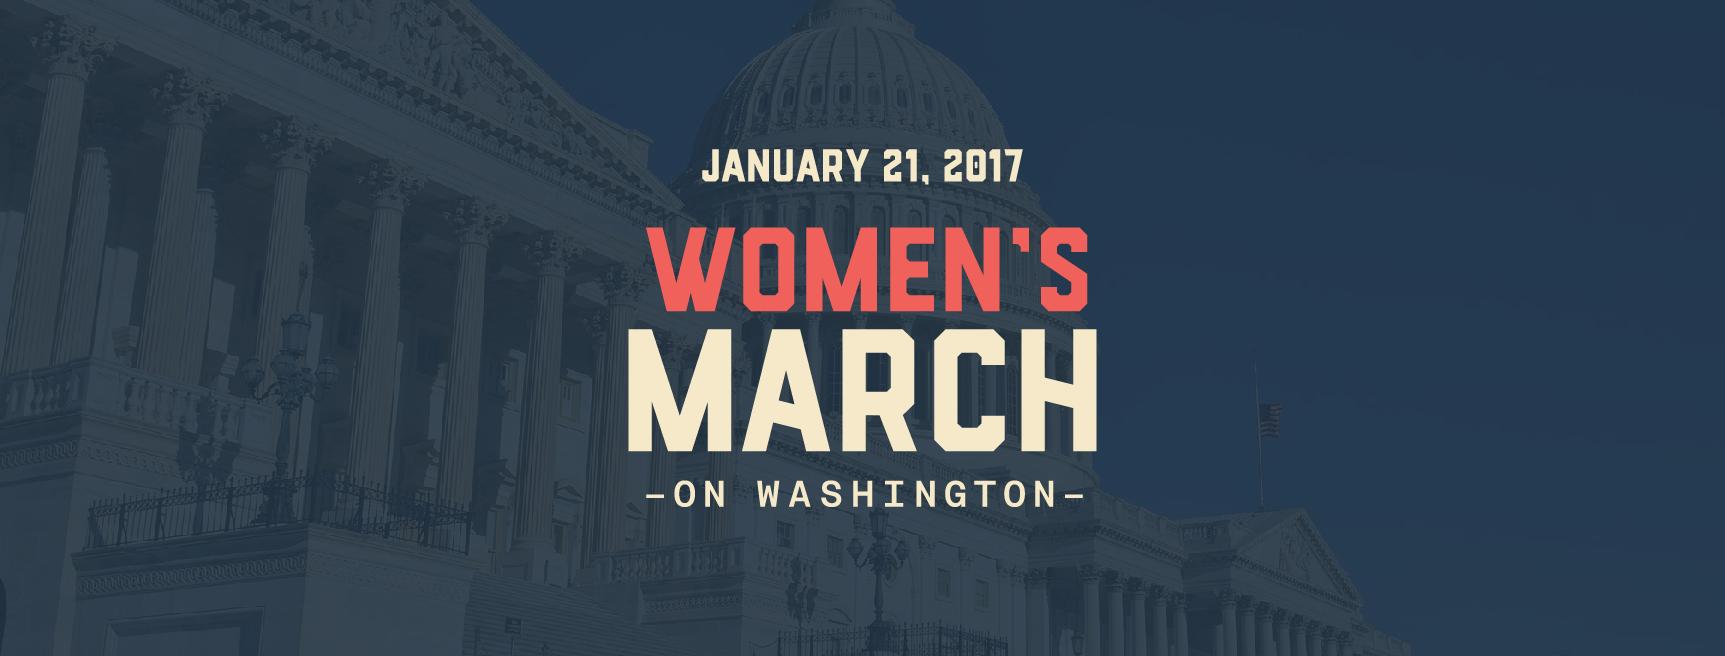 slider women's march on Washington